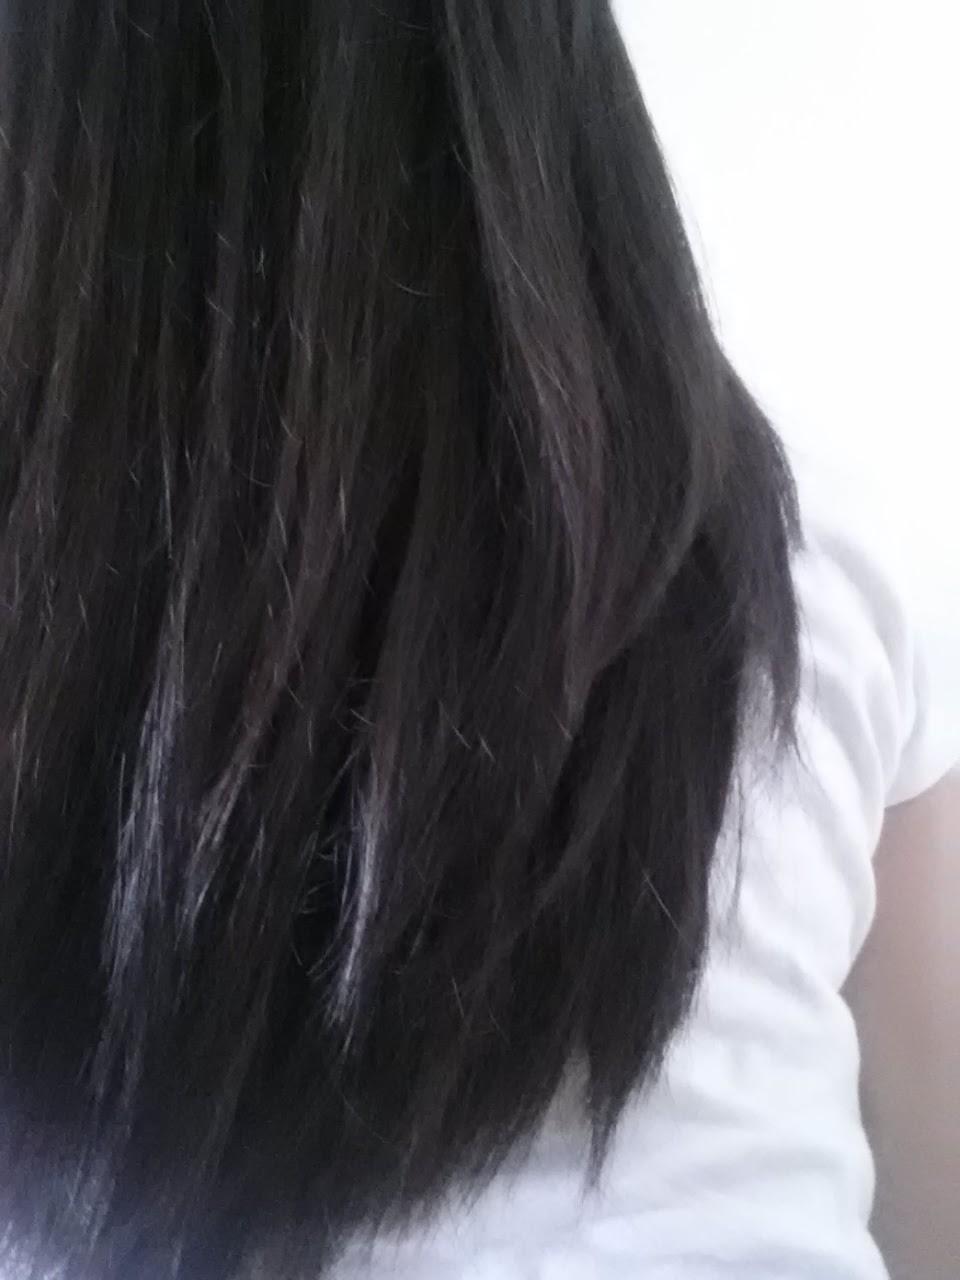 Liese Bubble Hair Dye Review Rose Tea Brown First Snow